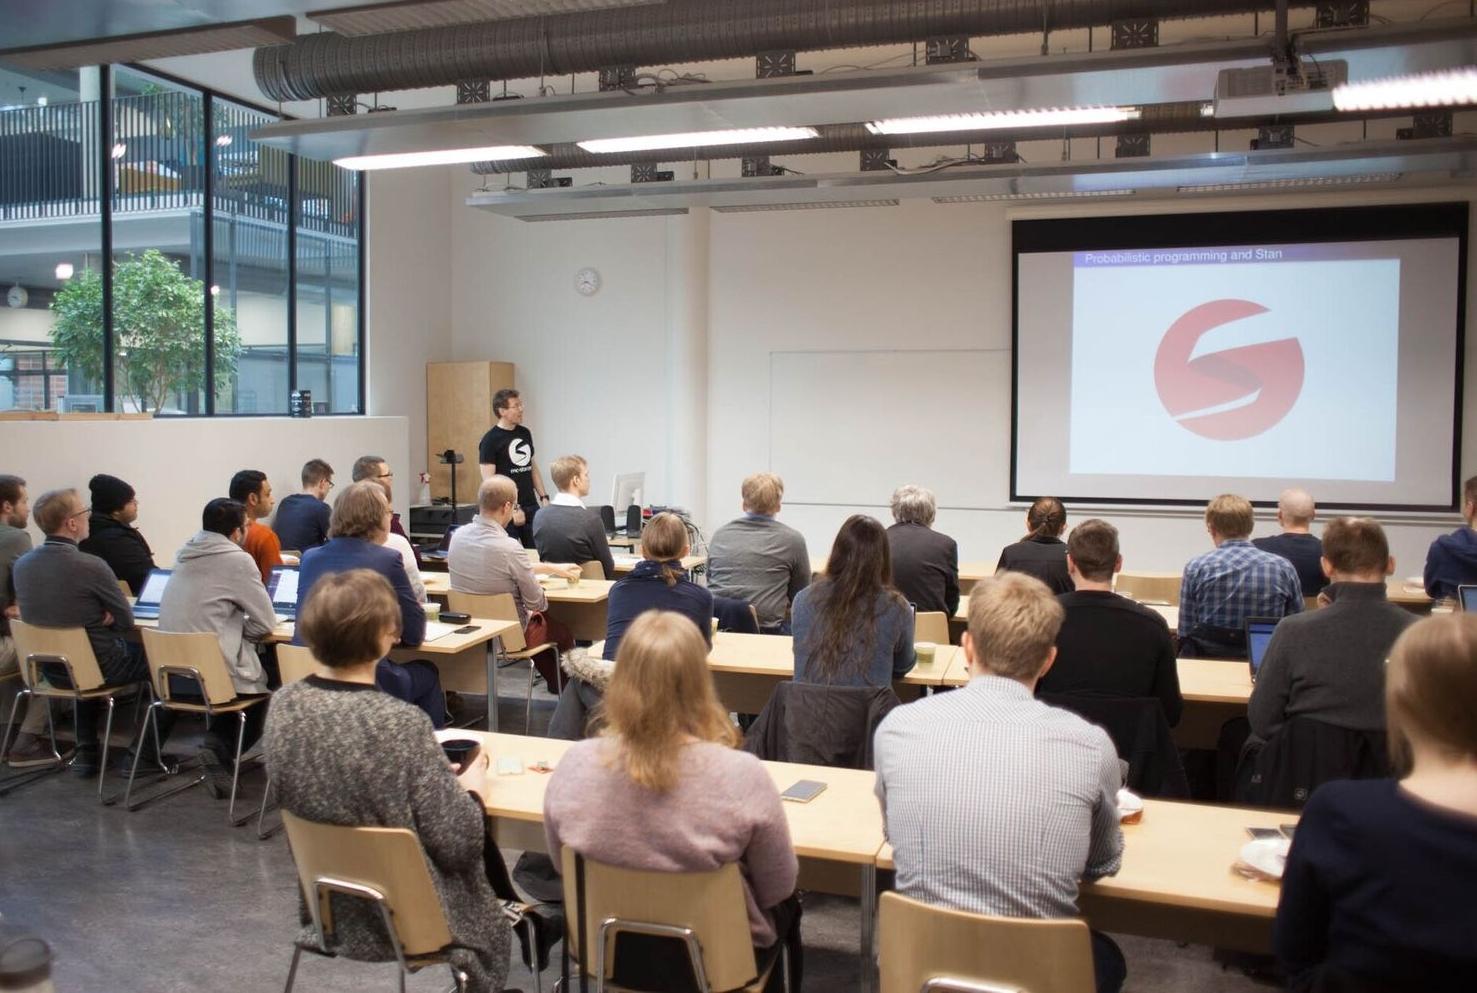 Aki Vehtari's talk on Stan and Probabilistic programming as a part of FCAI Machine Learning Coffee Minisymposium on AI in Spring 2018. Image: Matti Ahlgren